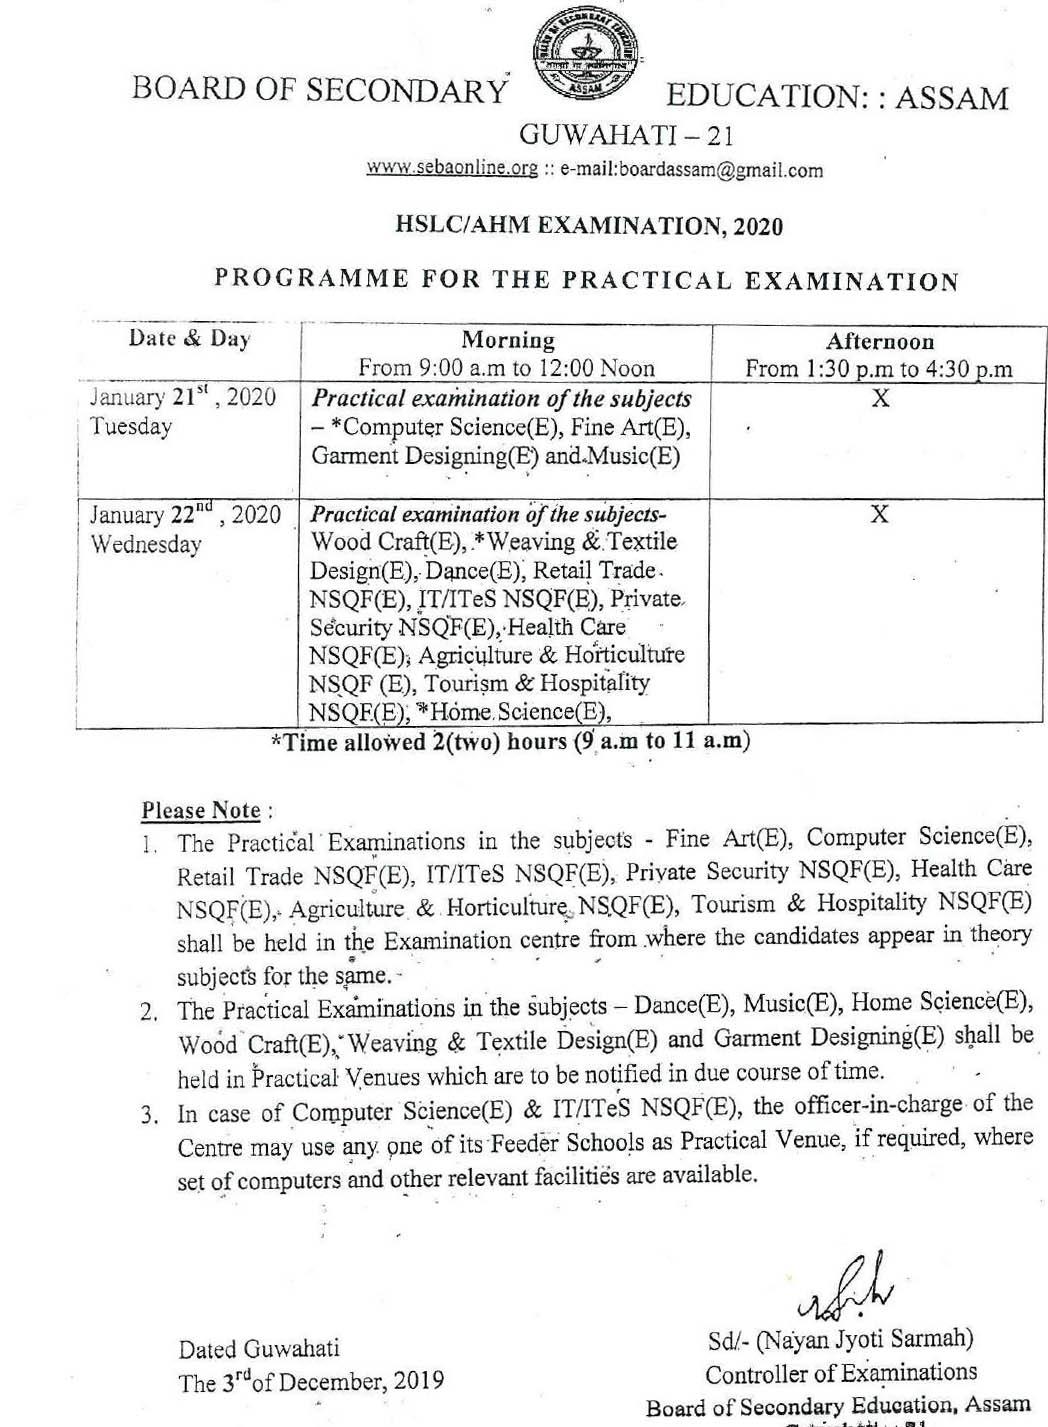 Assam HSLC Practical Routine 2020